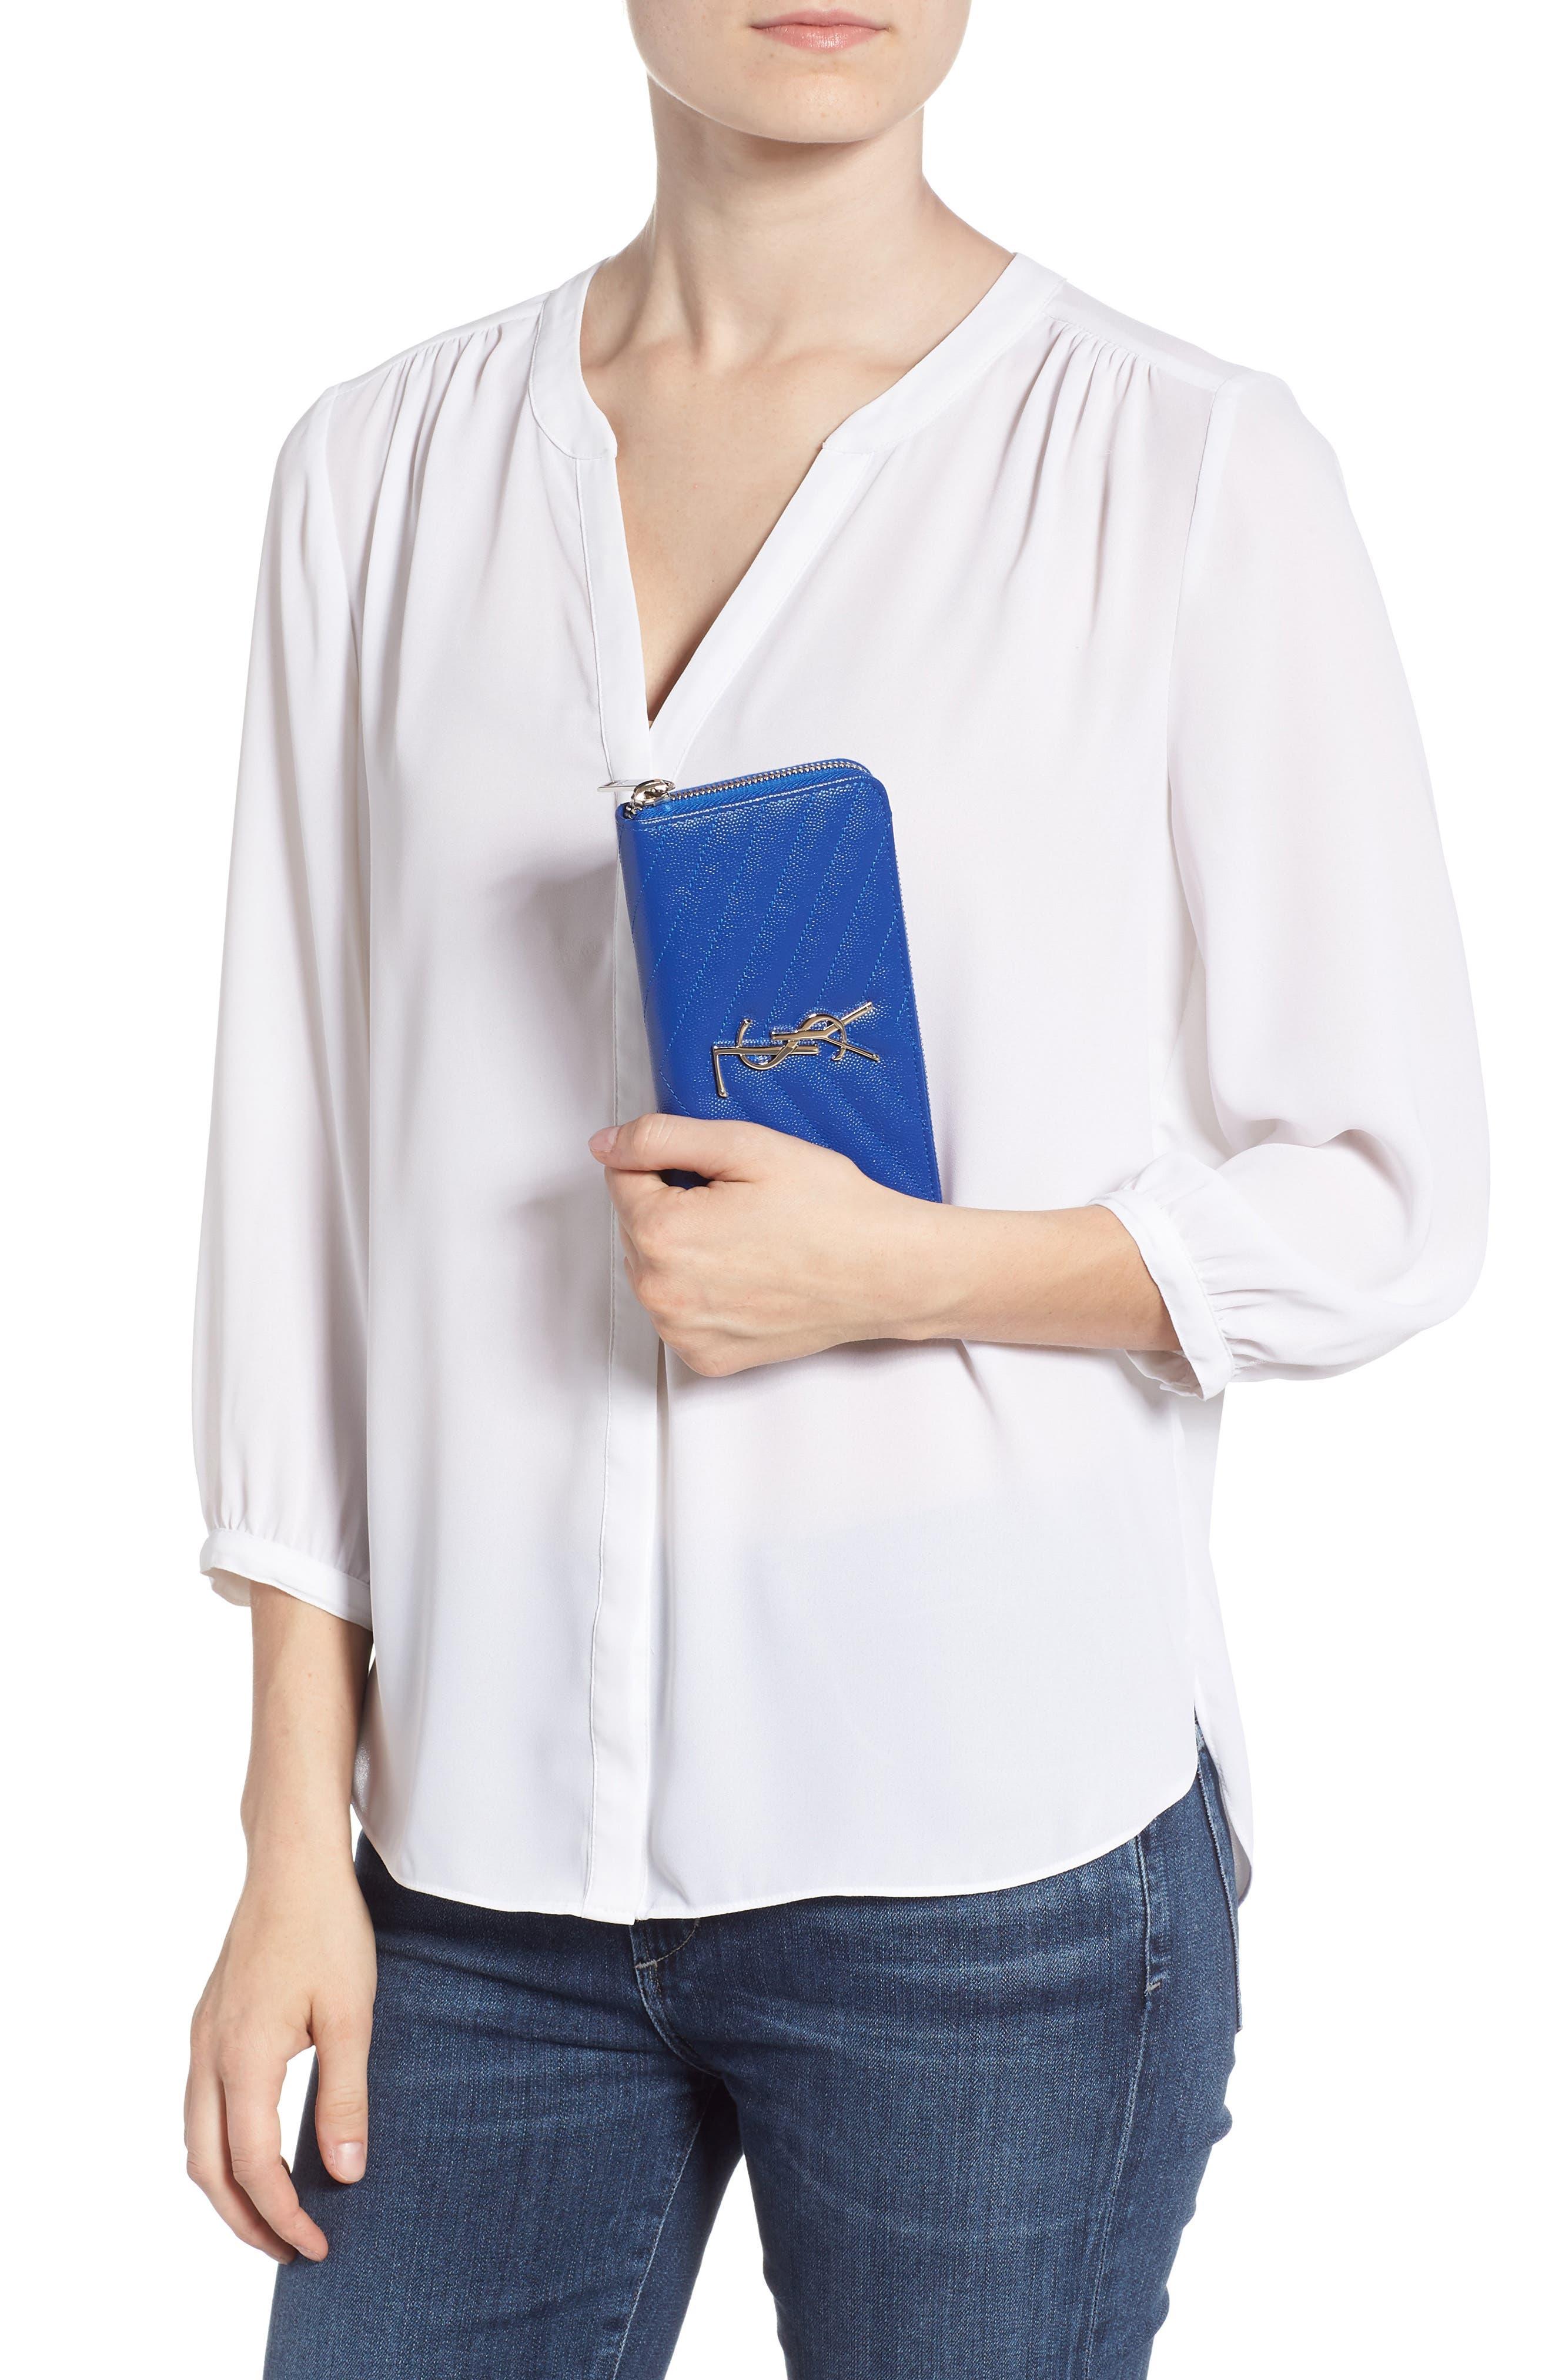 SAINT LAURENT,                             'Monogram' Zip Around Quilted Calfskin Leather Wallet,                             Alternate thumbnail 2, color,                             BRIGHT BLUE